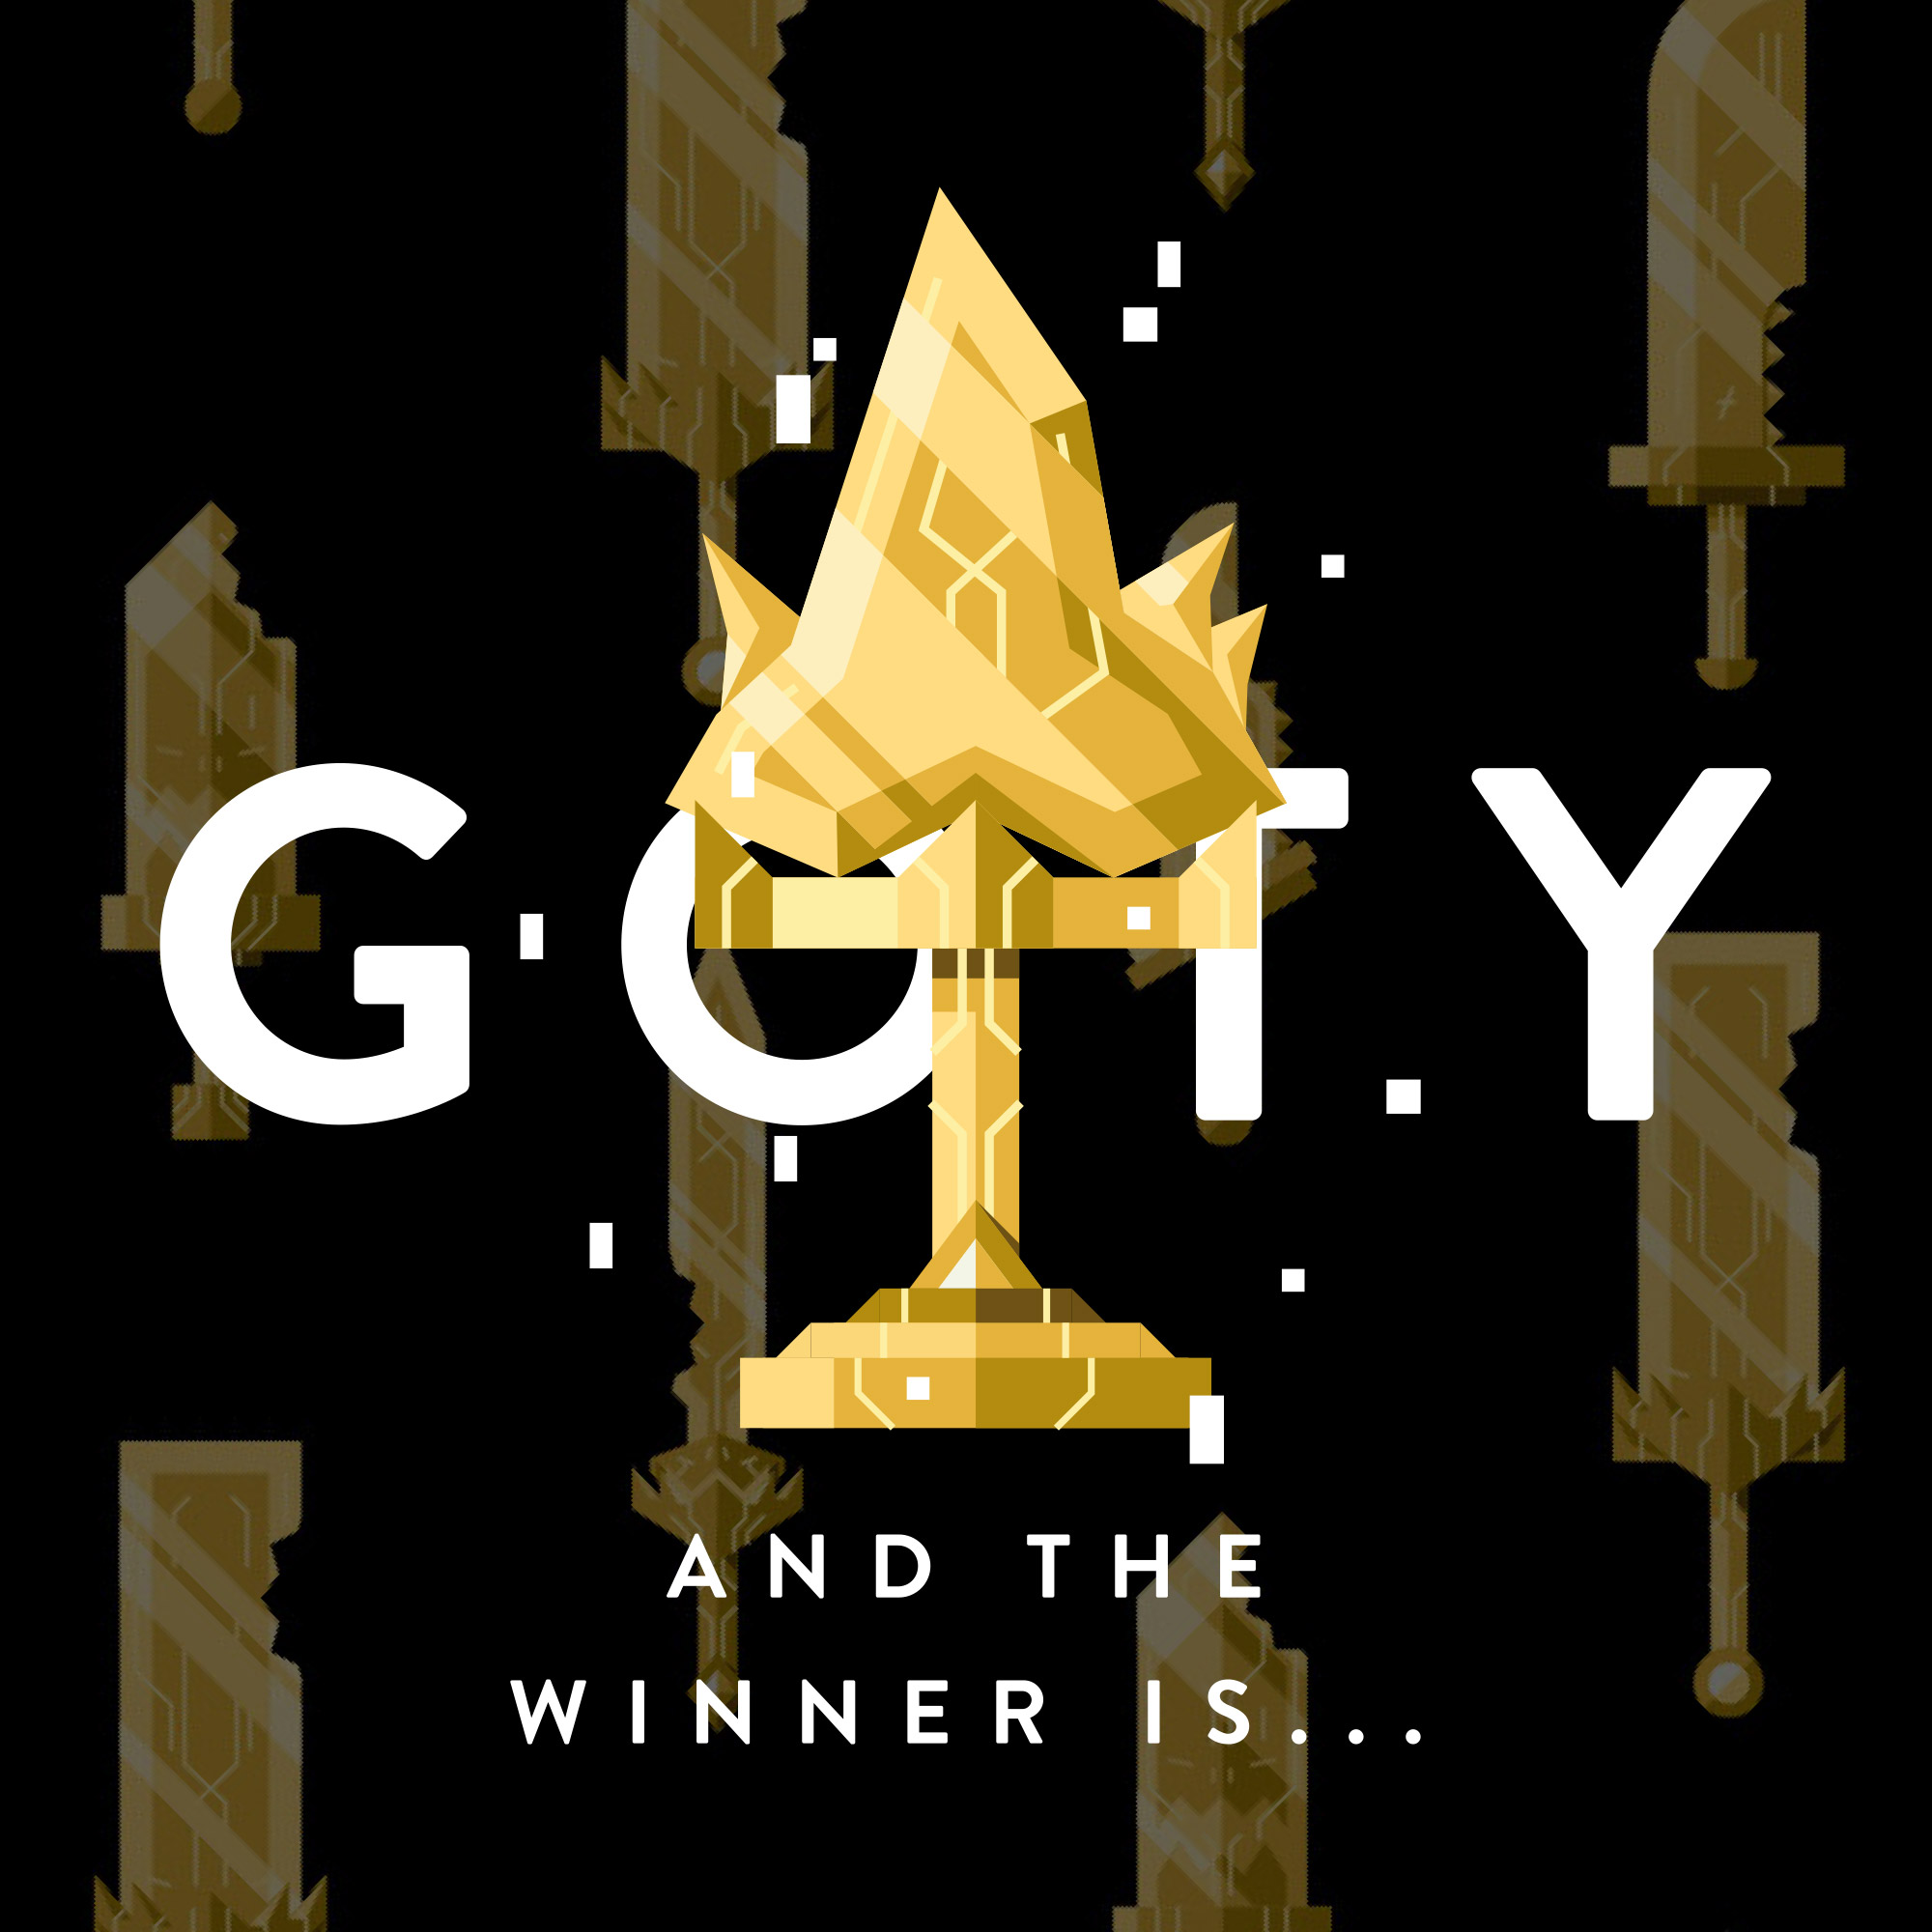 The-Daggertooth-Awards_Square-Artwork_3.jpg